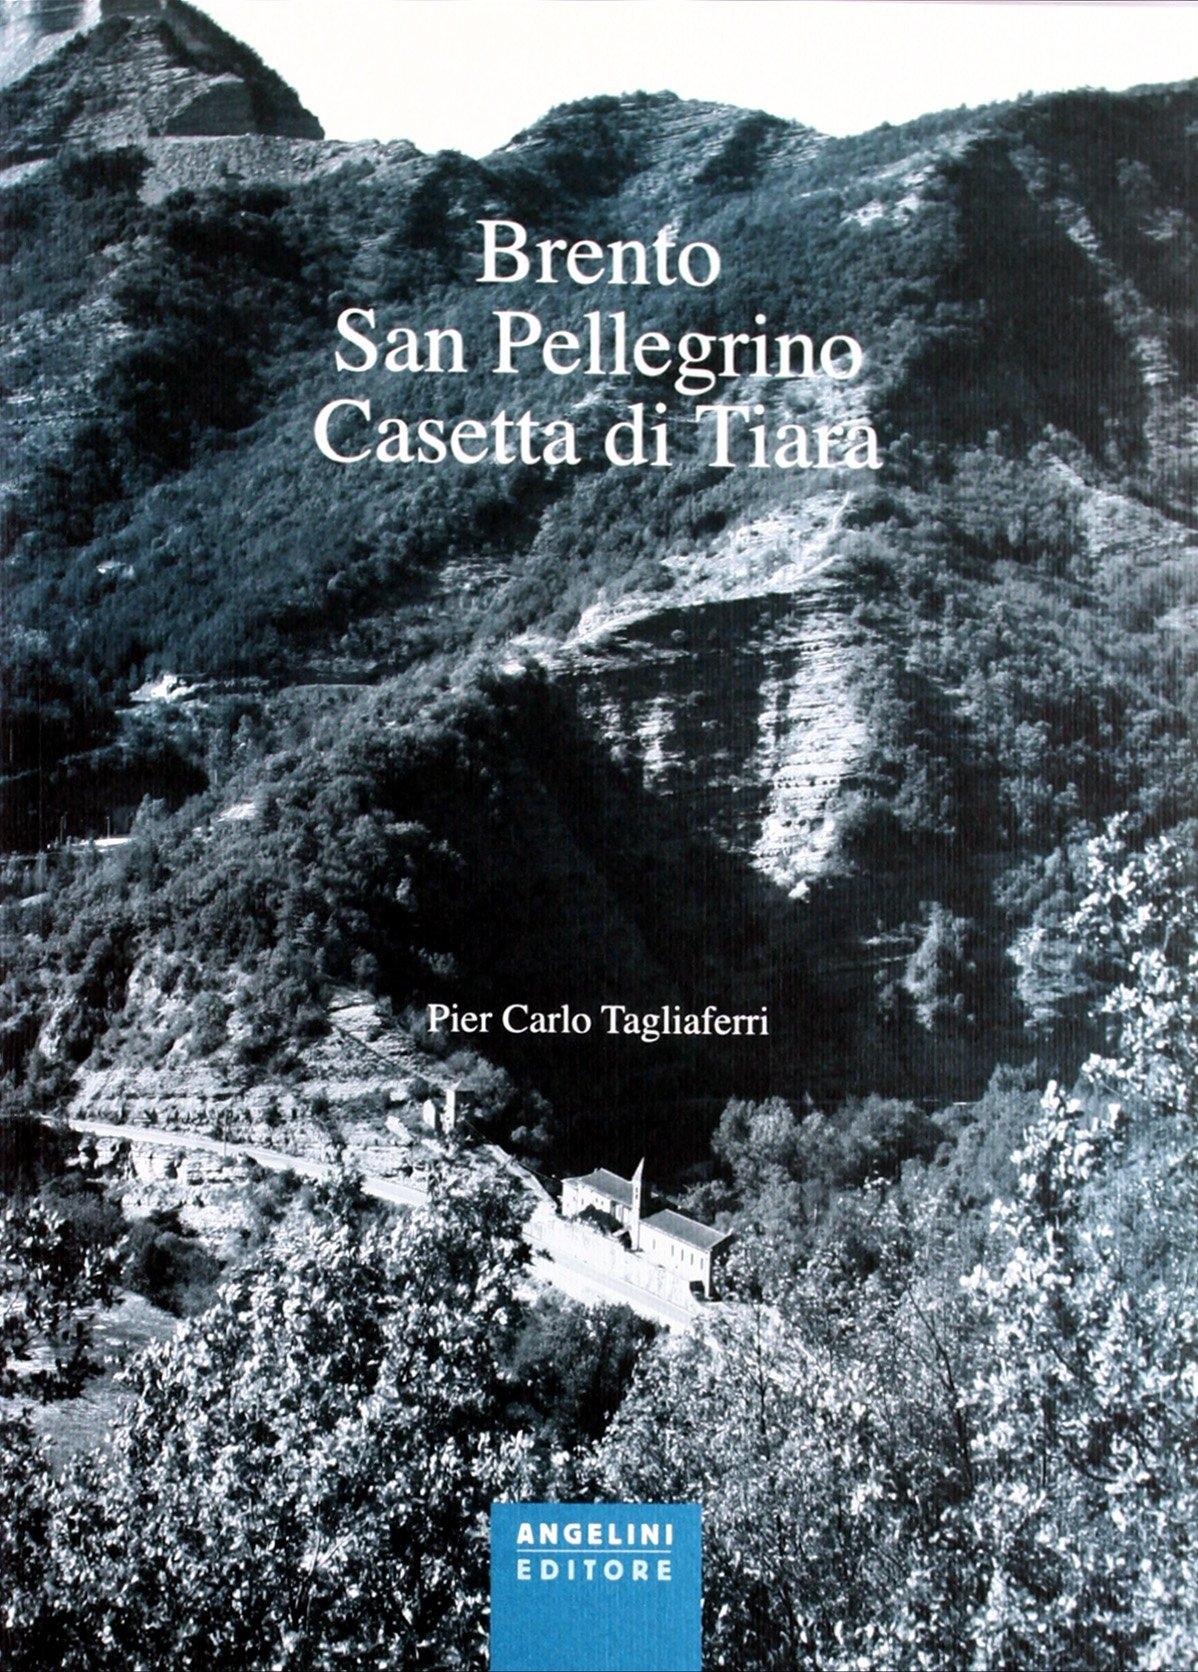 Brento, San Pellegrino, Casetta di Tiara